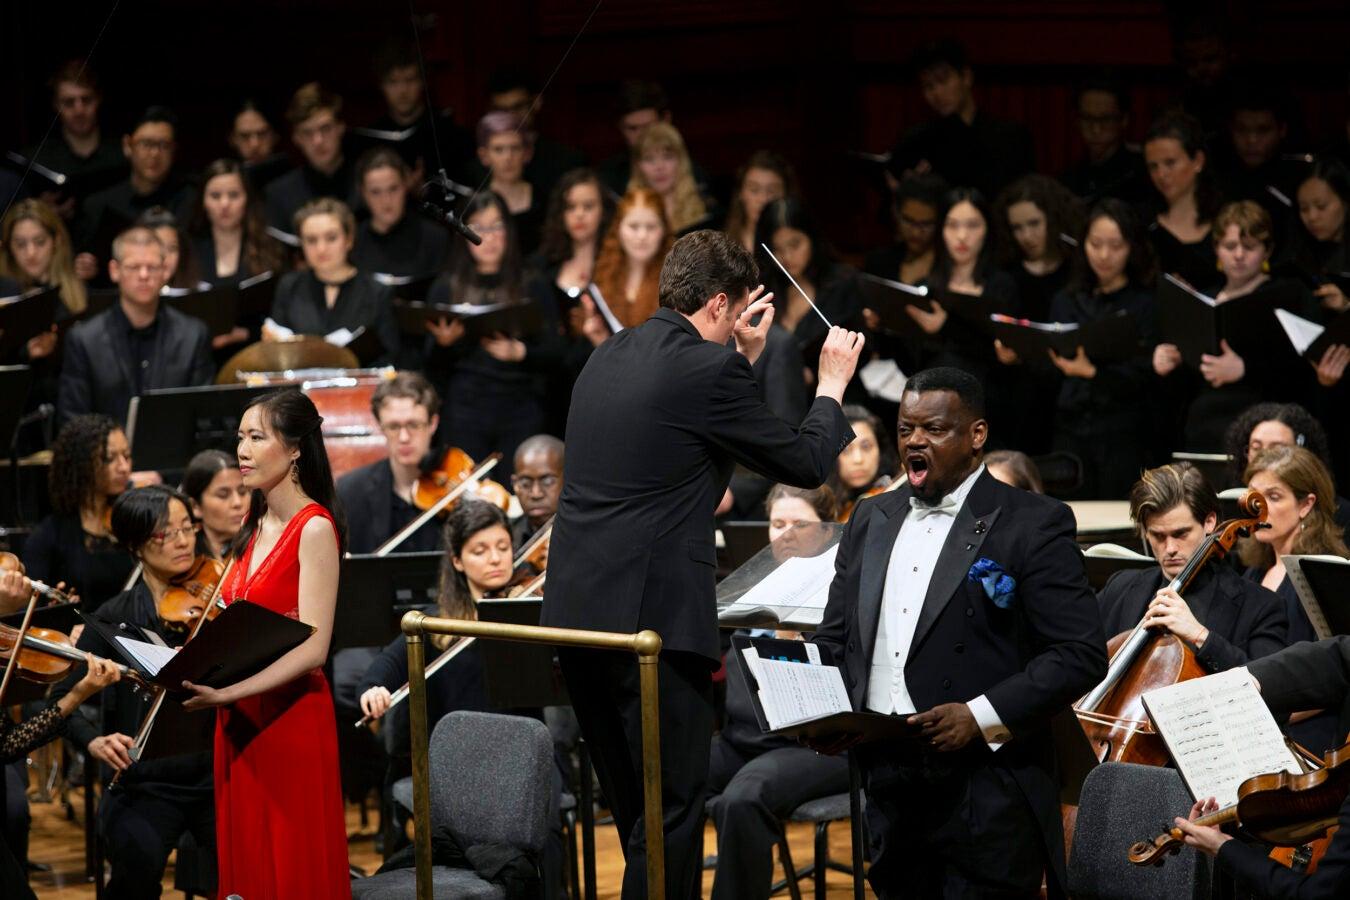 Harvard Glee Club, Radcliffe Choral Society, and Harvard-Radclife Collegium perform.